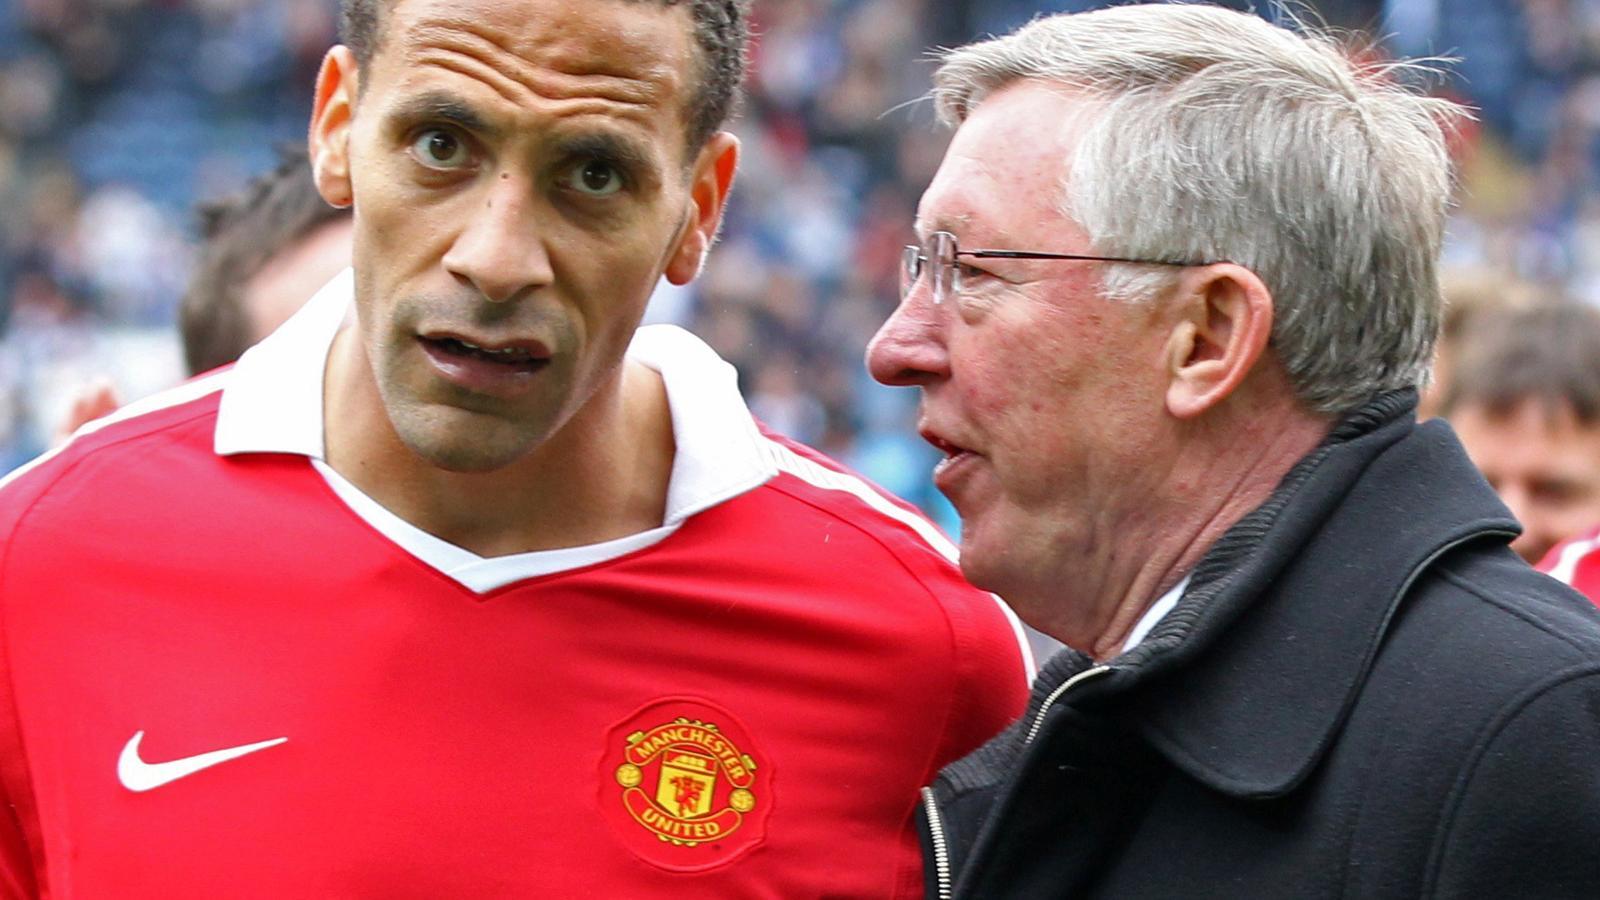 Sir Alex Ferguson and Rio Ferdinand while at Manchester United